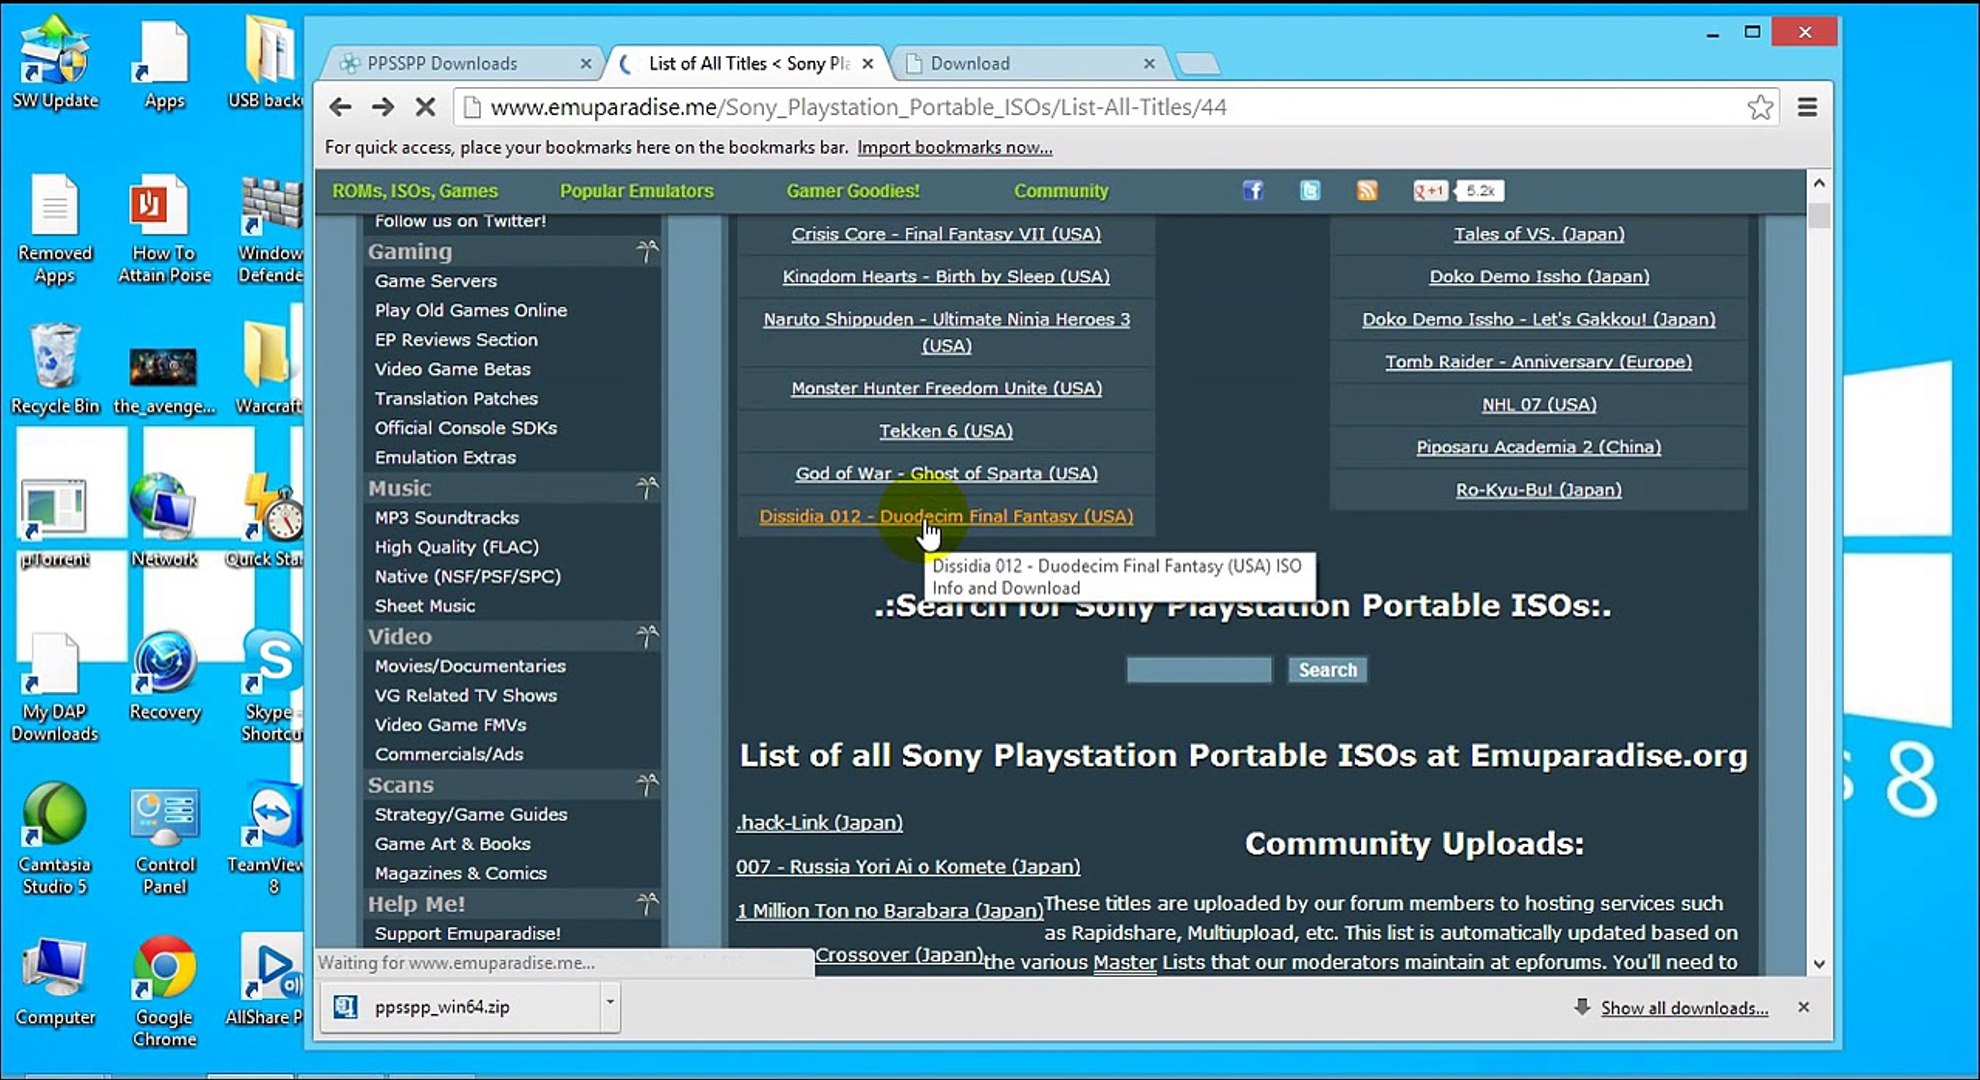 Play PSP games on Windows PC using PPSSPP Emulator